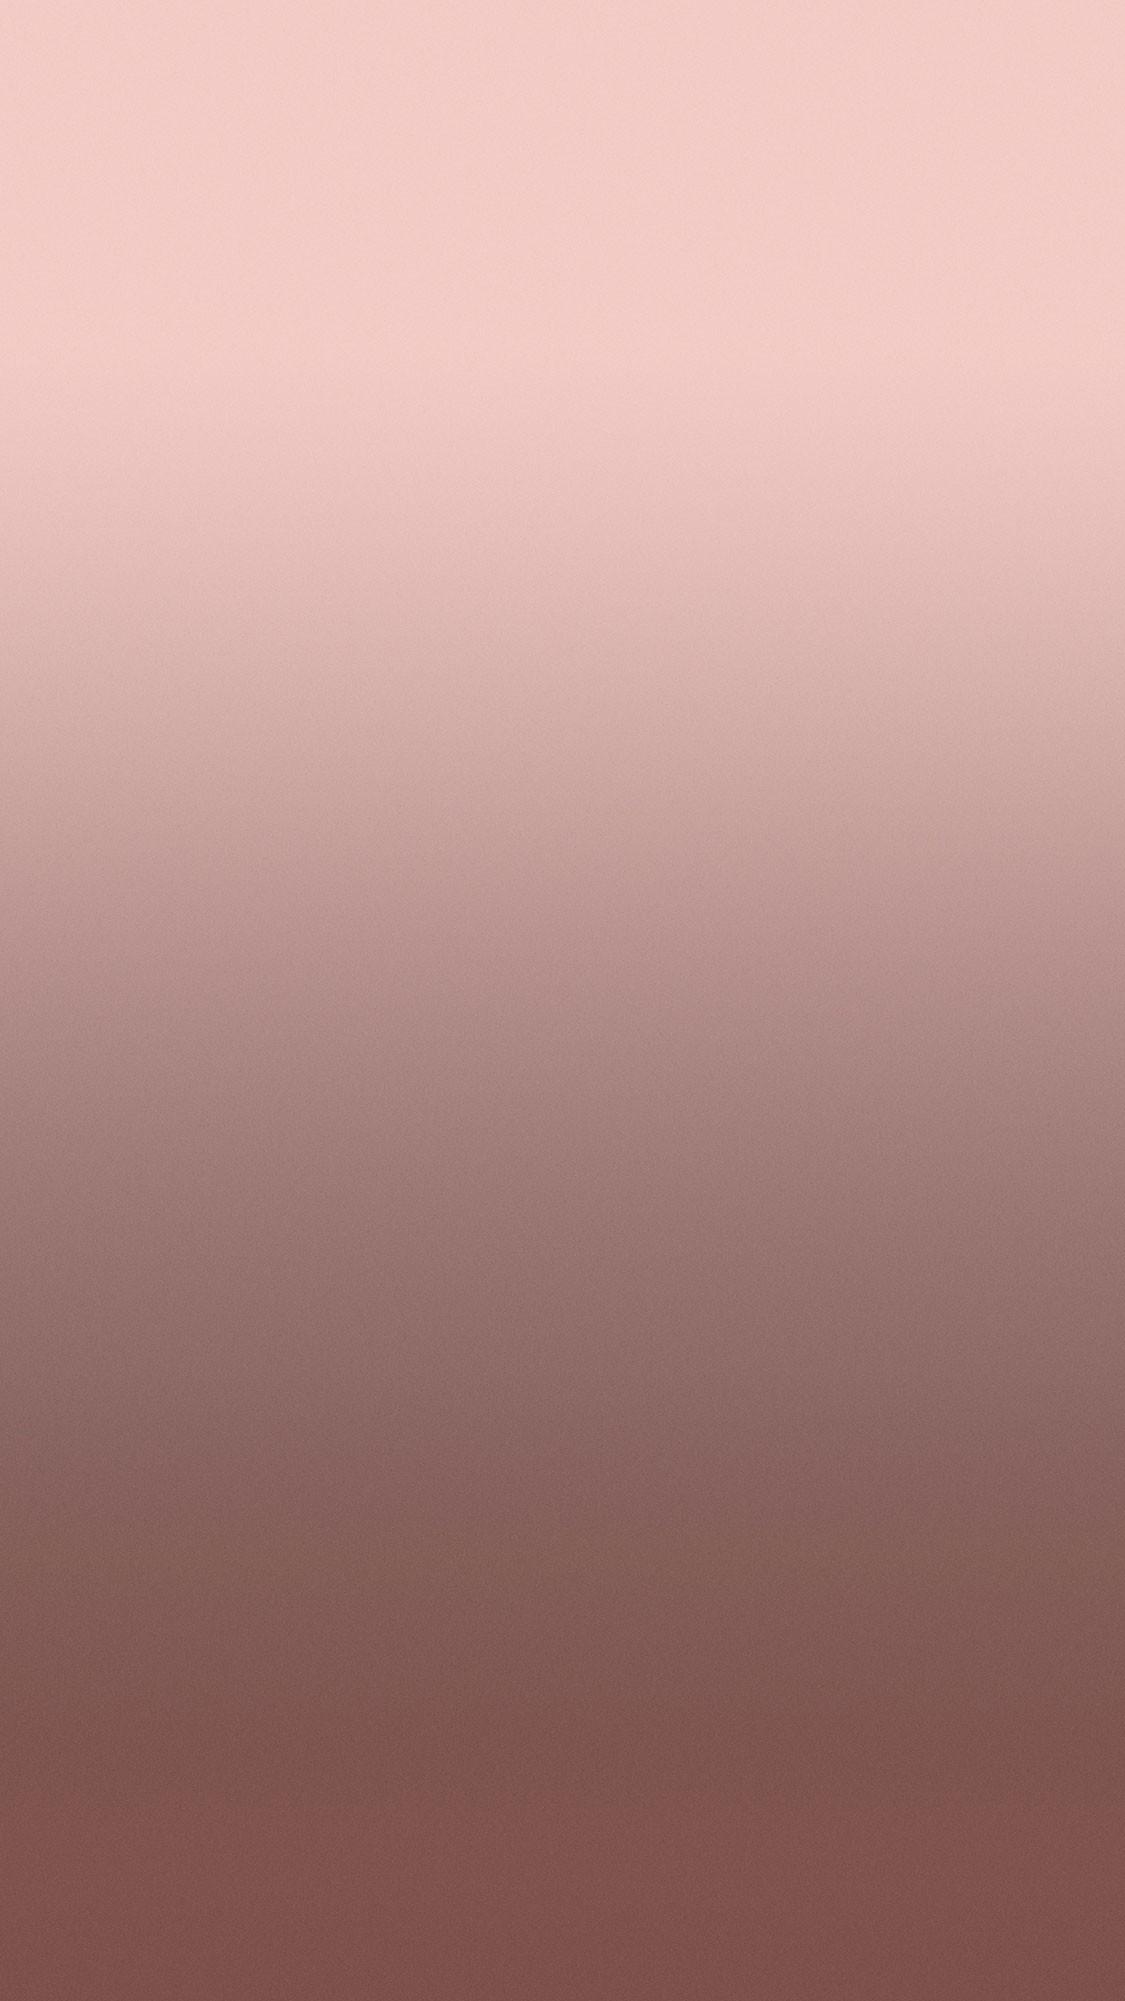 Ombre Rose Gold Marble Tumblr Wallpaper White Wallpaper